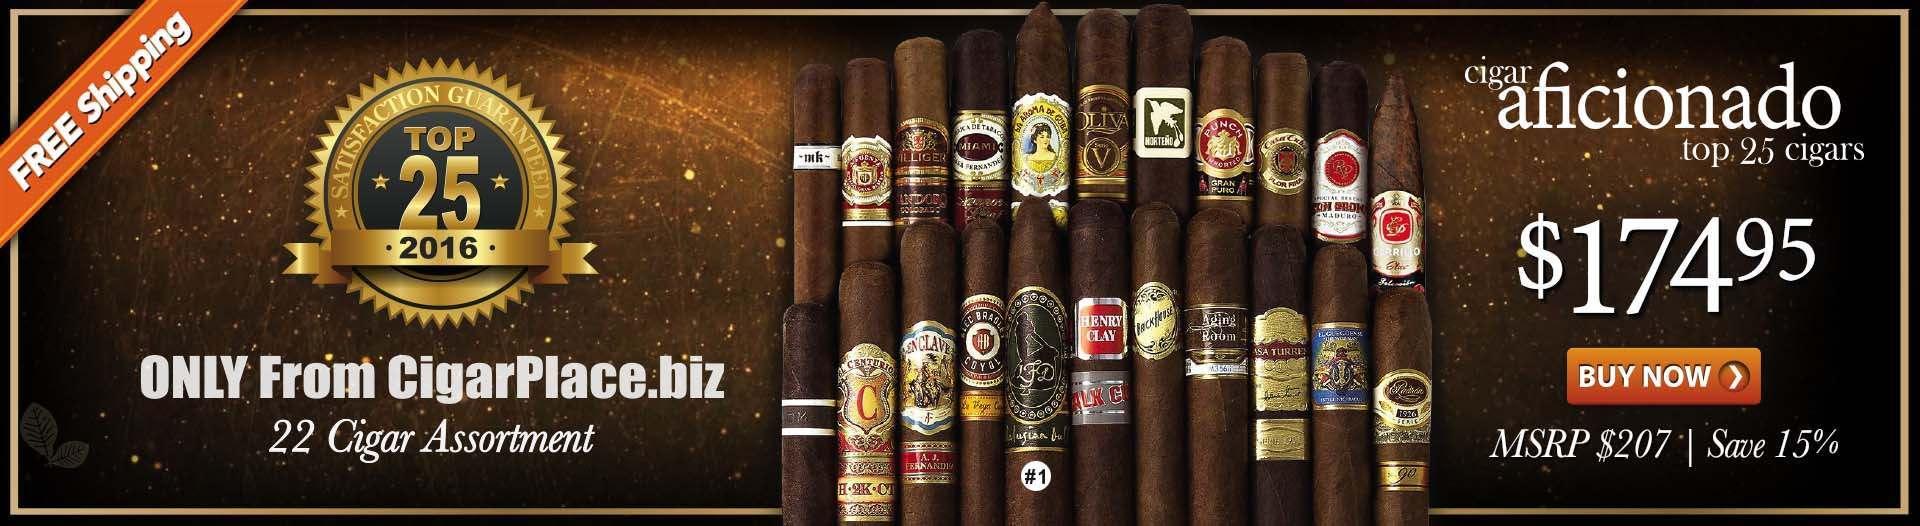 Cigar Aficionado Top 25 Cigars of 2016 Sampler